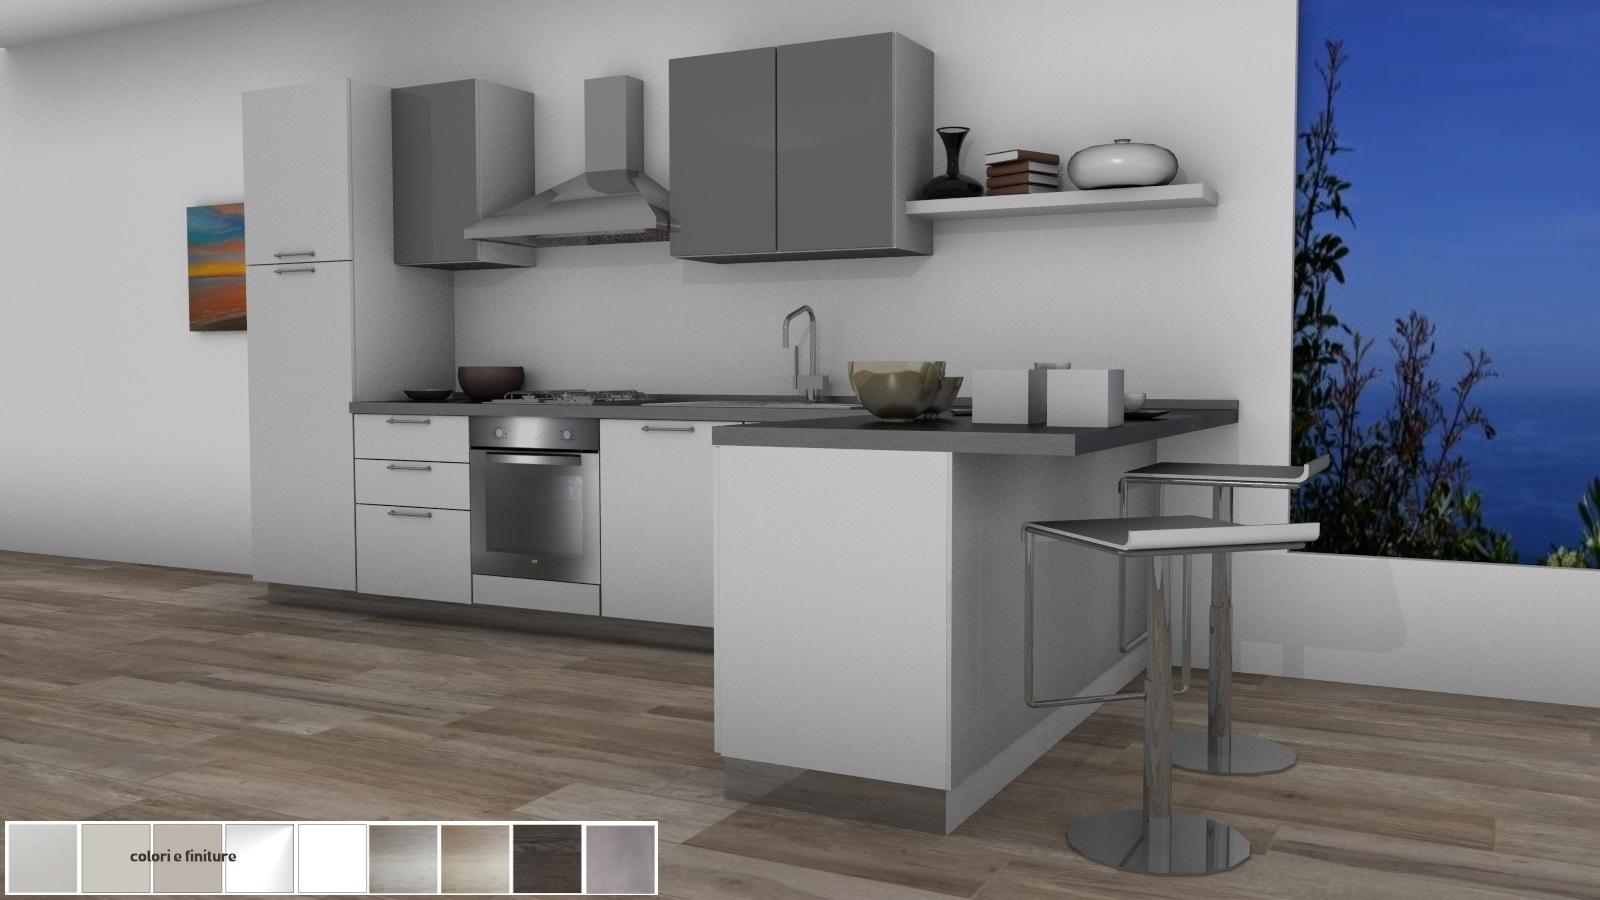 19 cucina con penisola 390X175